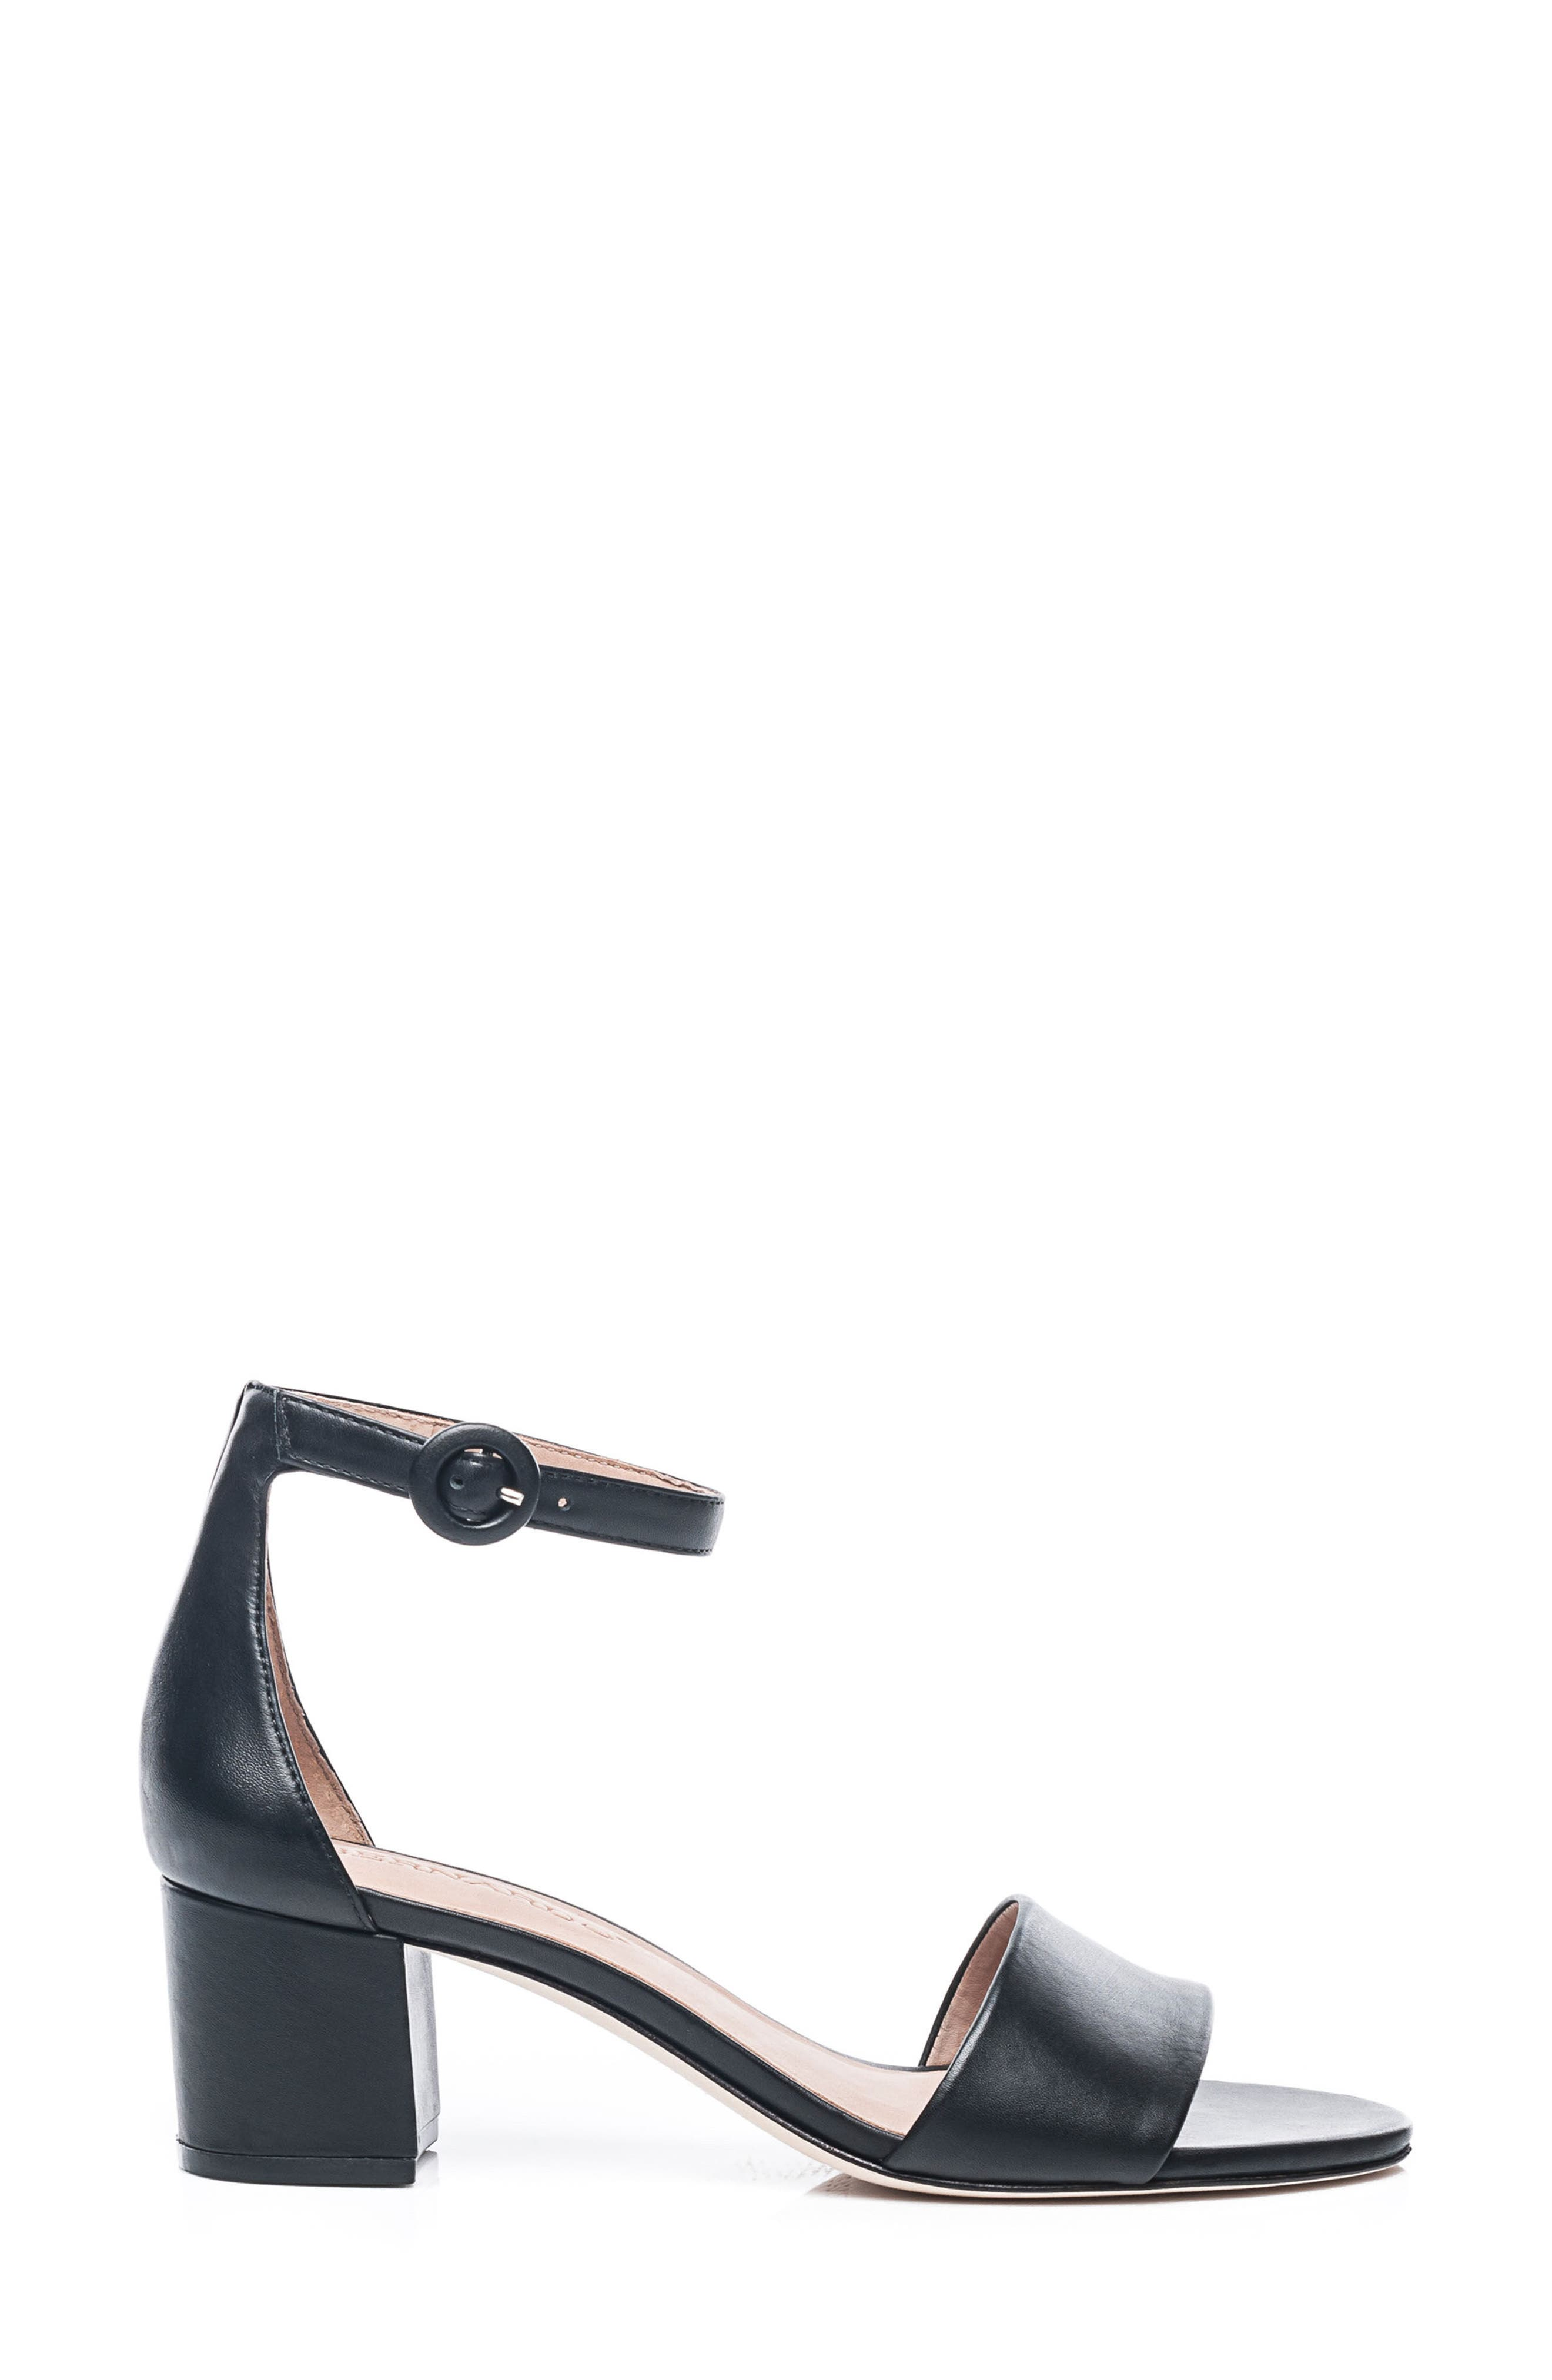 Bernardo Belinda Ankle Strap Sandal,                             Alternate thumbnail 3, color,                             BLACK LEATHER